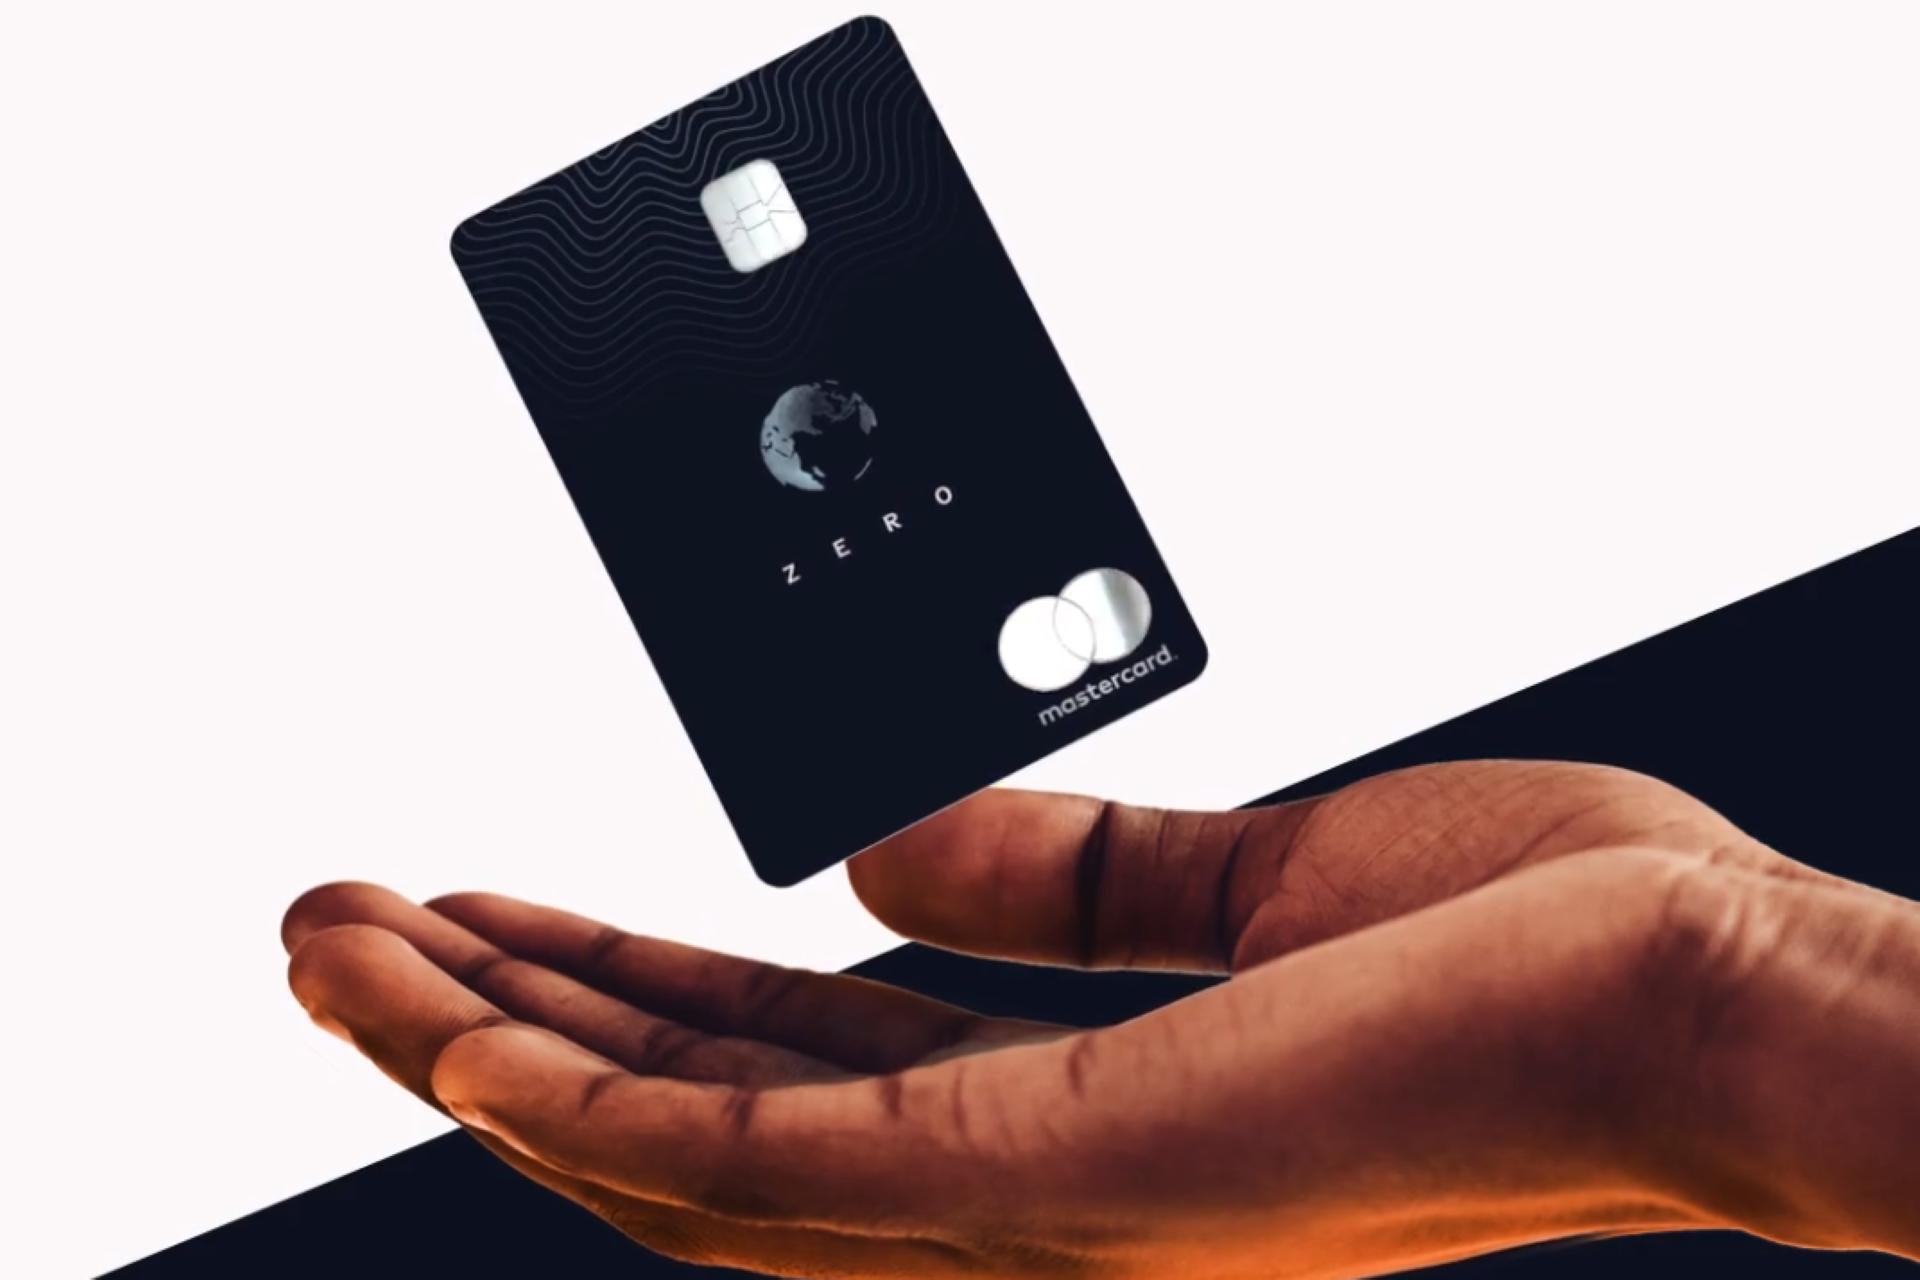 aspiration-zero-credit-card-fights-climate-change